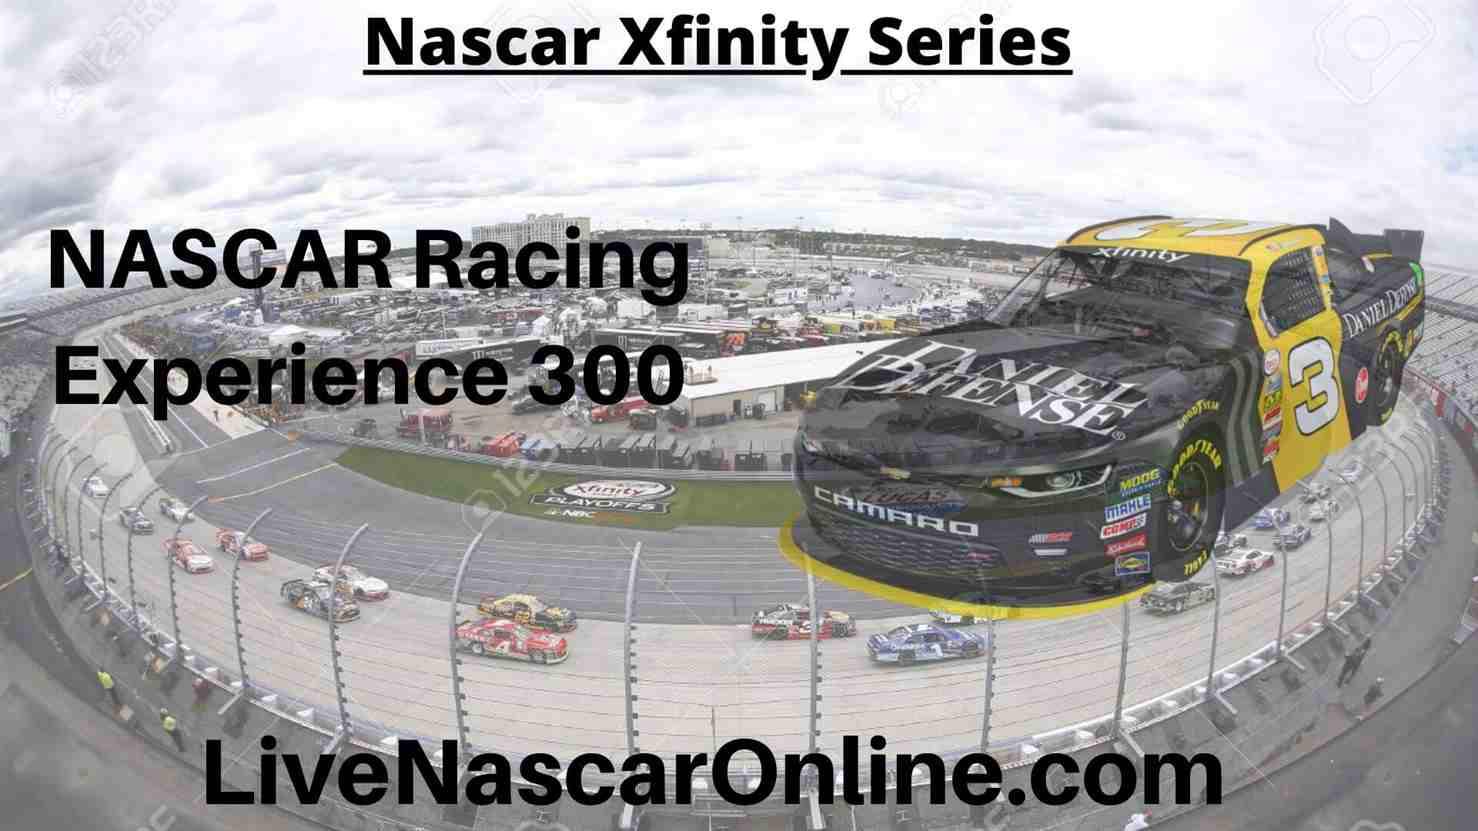 NASCAR Racing Experience 300 Online Stream | NASCAR Daytona 2020